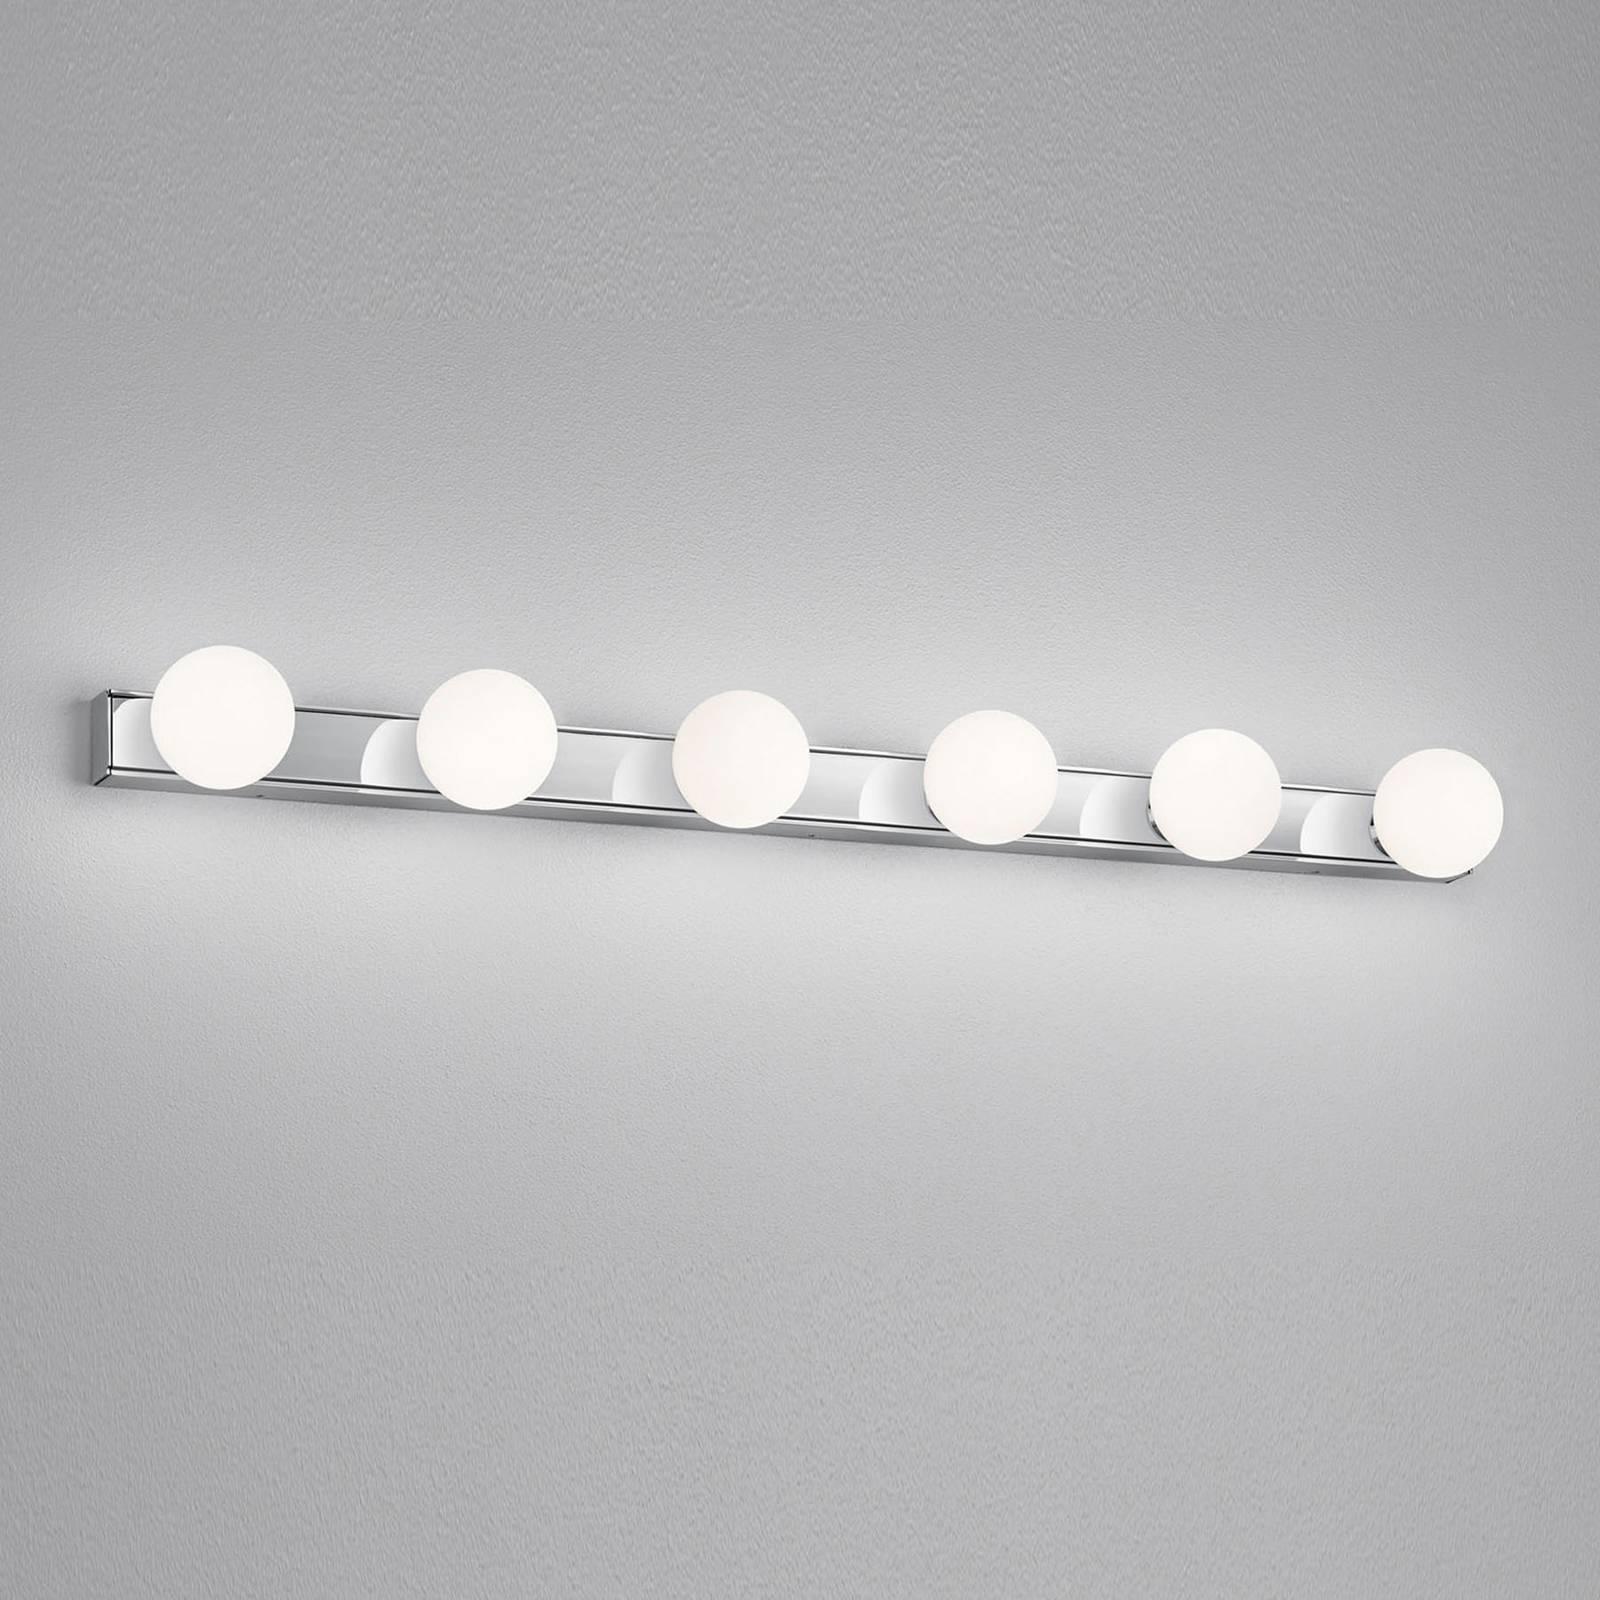 Helestra Lis -LED-peililamppu, 6-lamppuinen